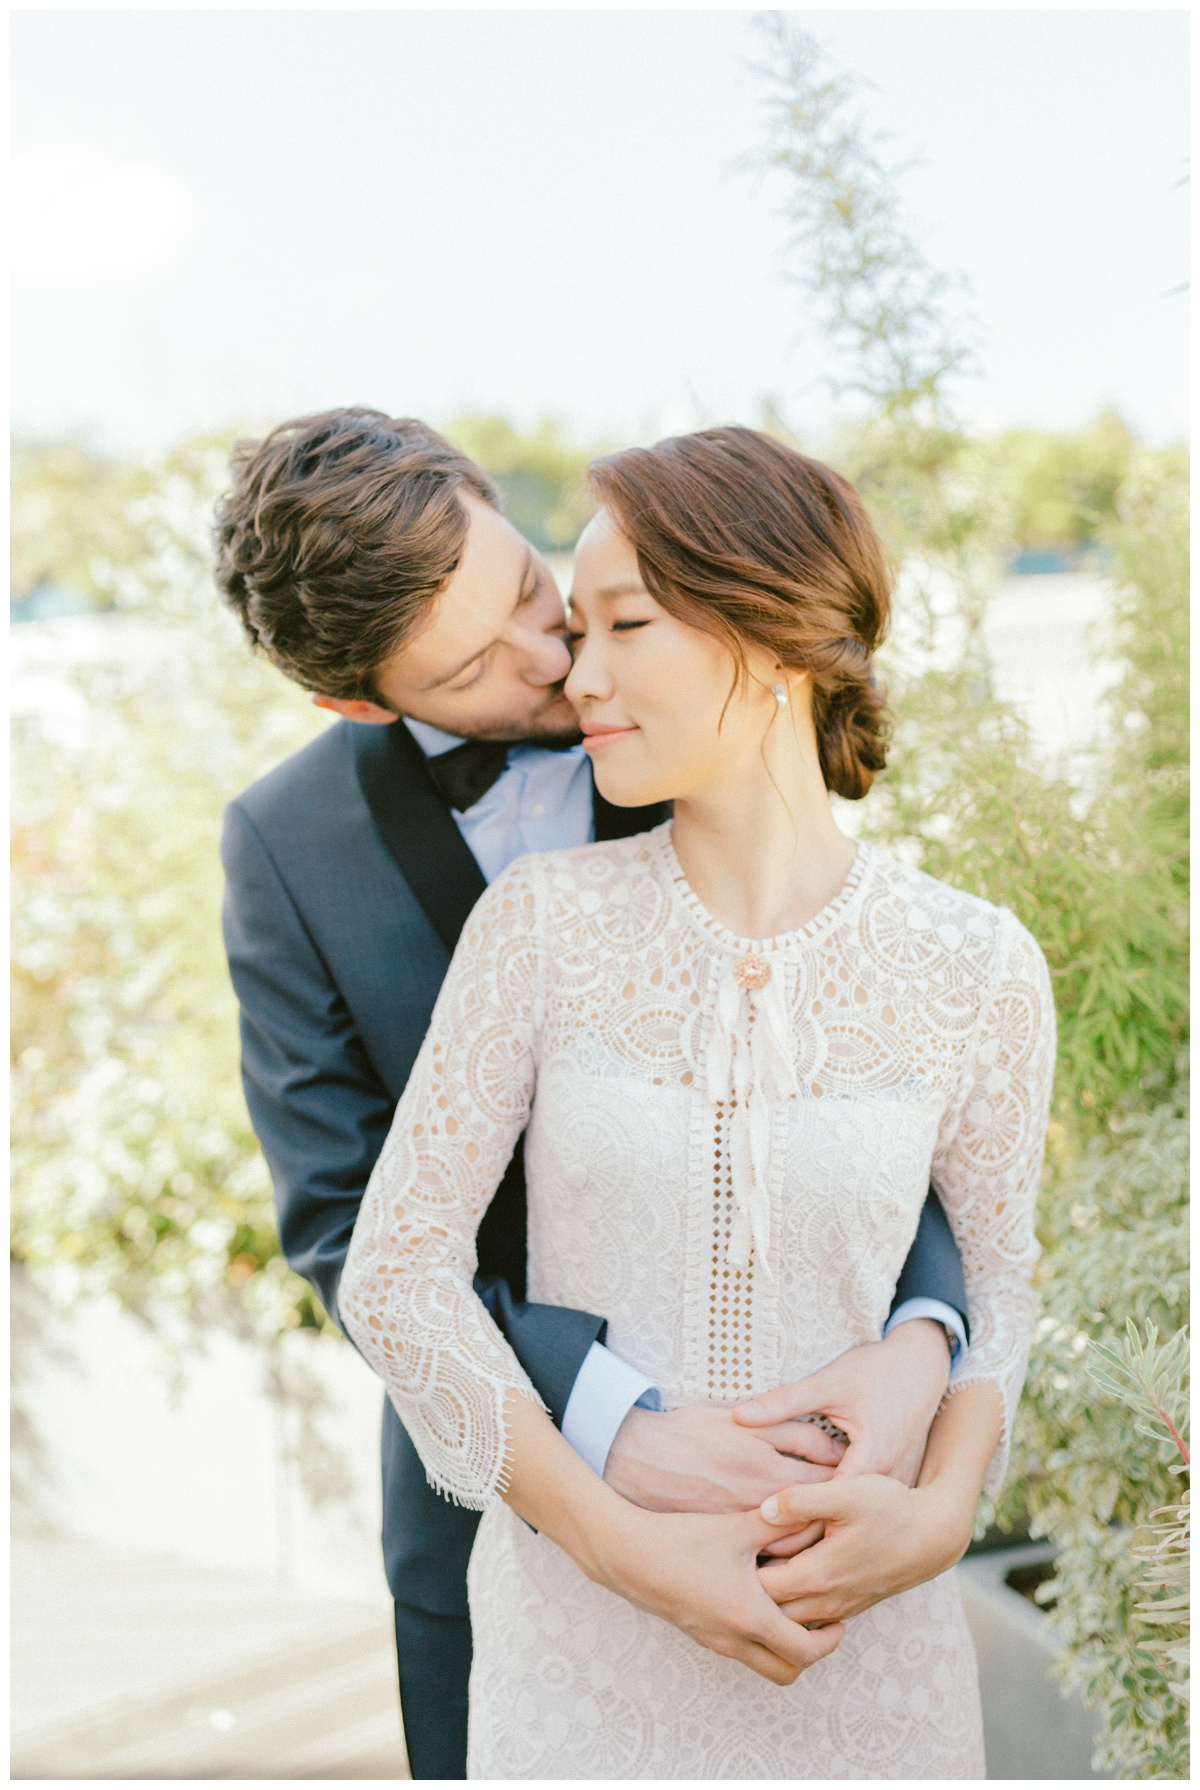 Mattie C. Fine Art Wedding Prewedding Photography Vancouver and Hong Kong 78.jpg